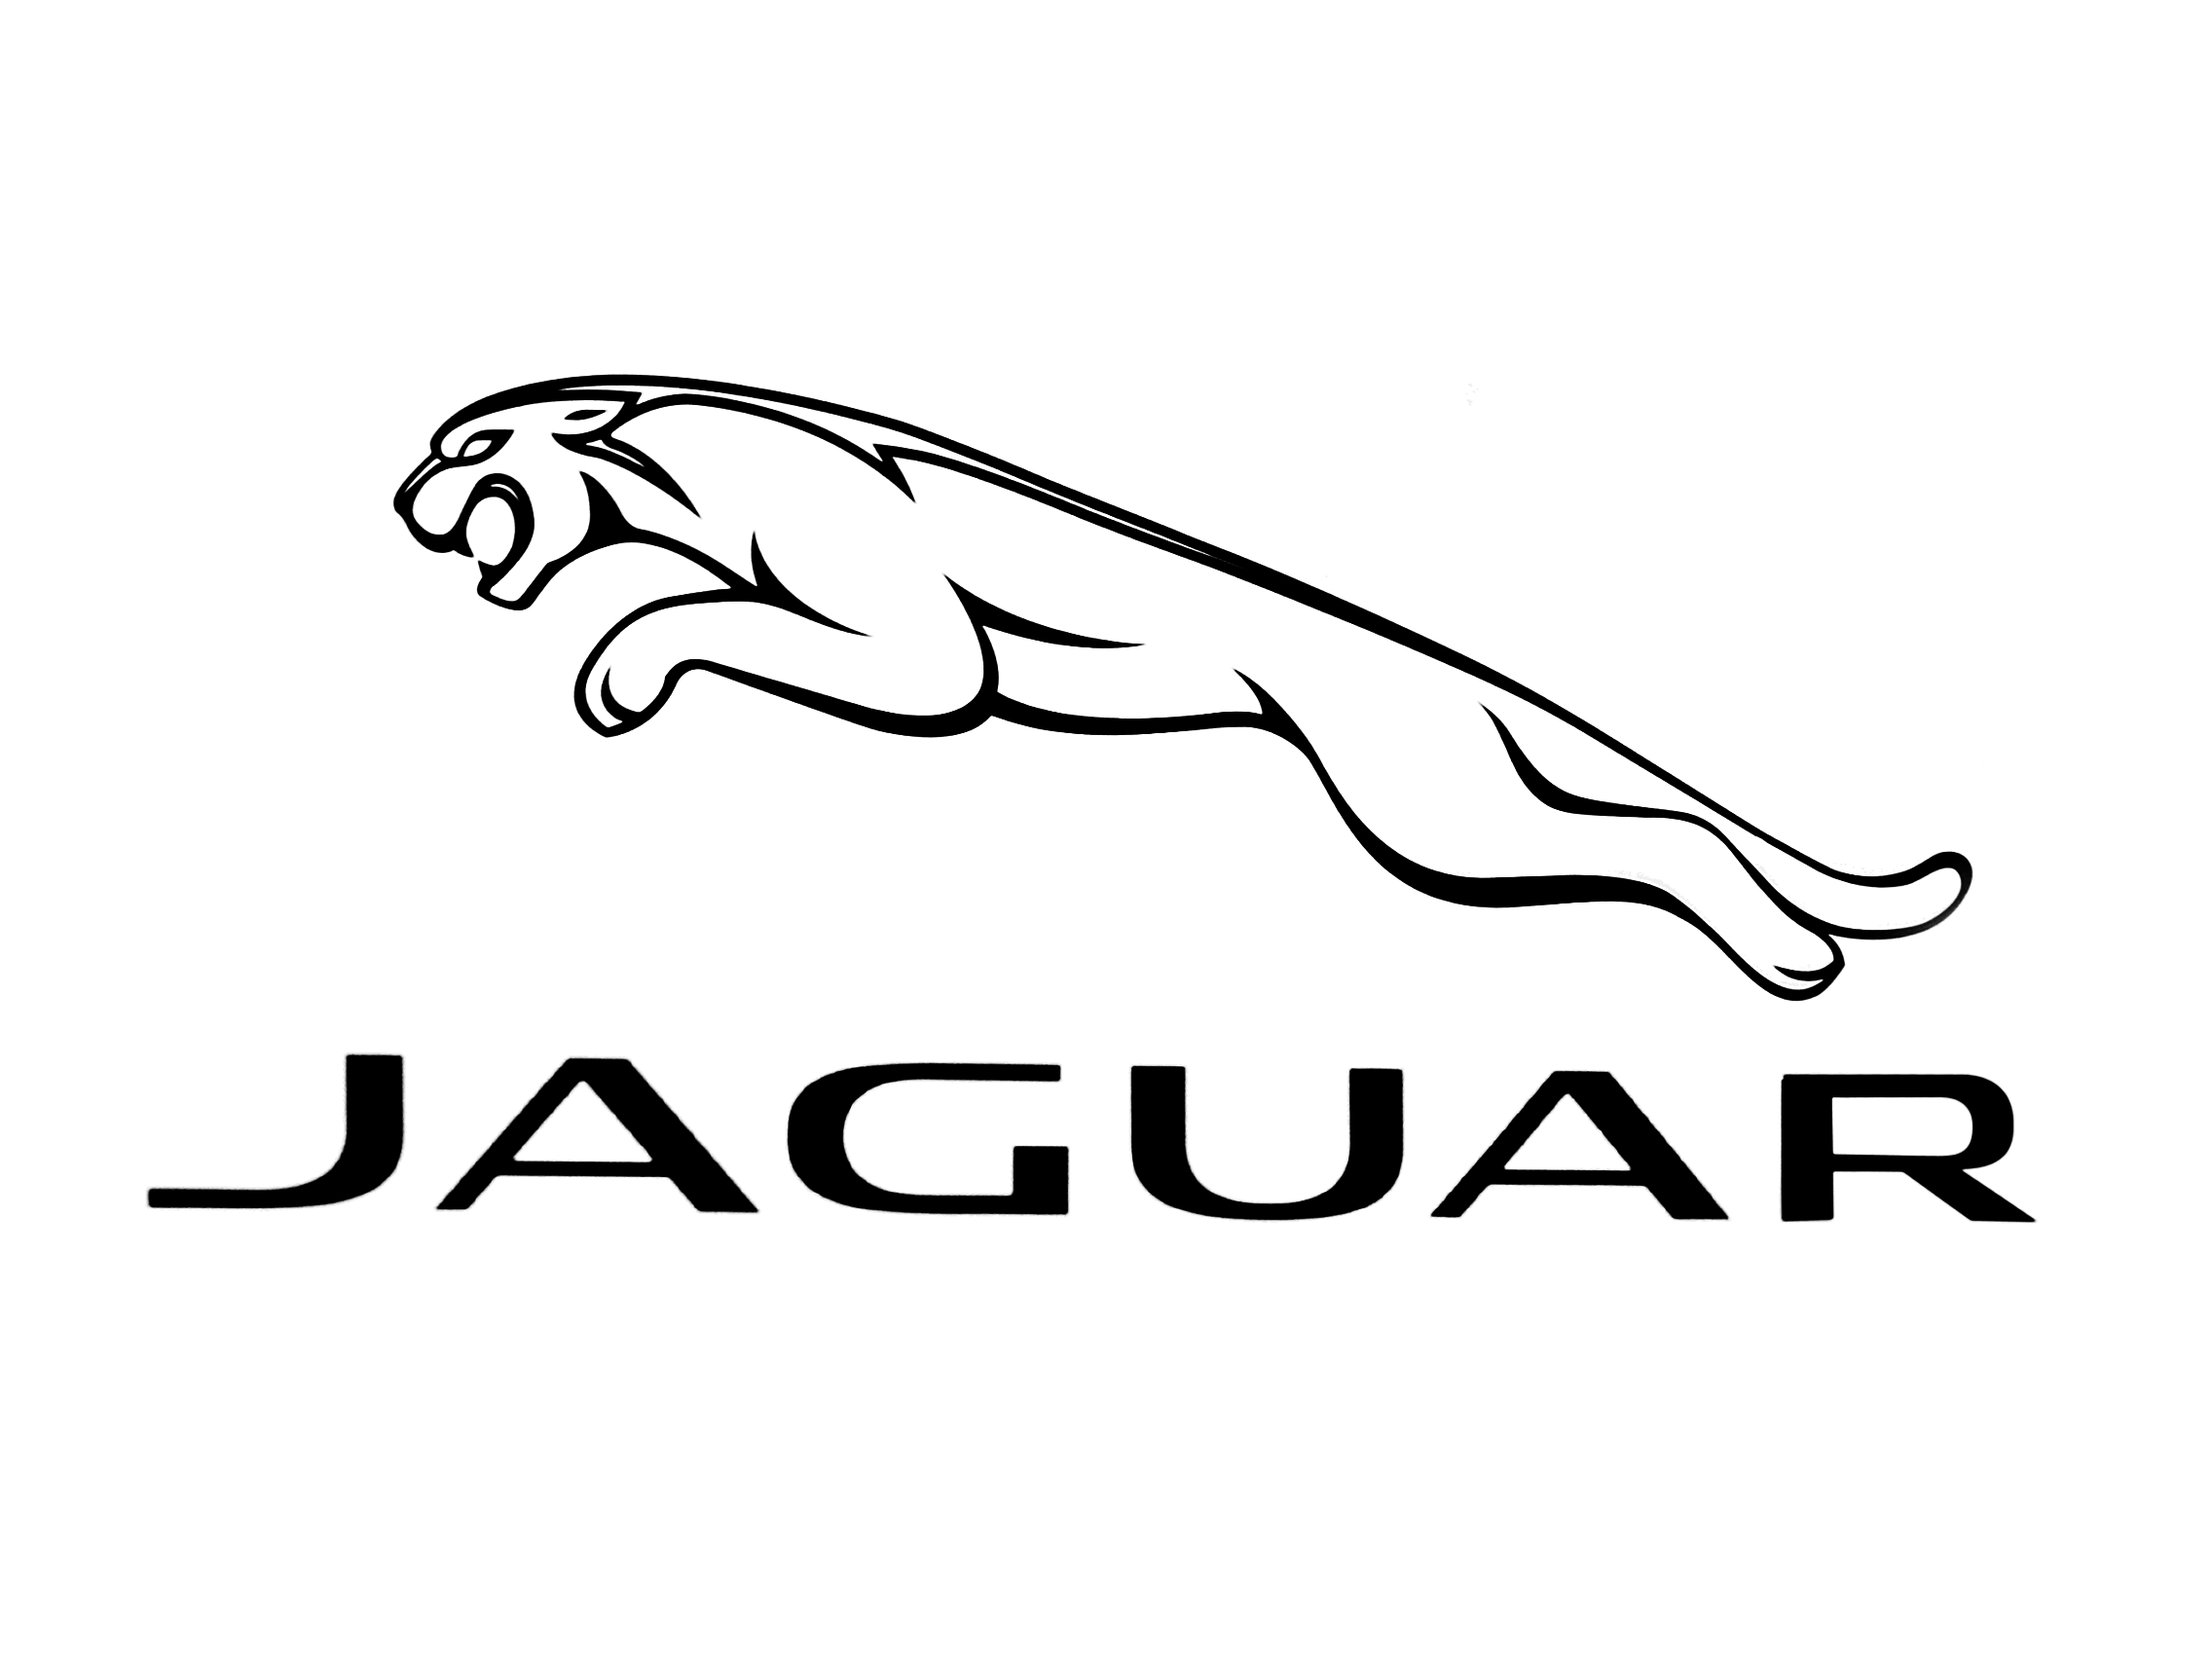 Jaguar Clipart White Background Jaguar White Background